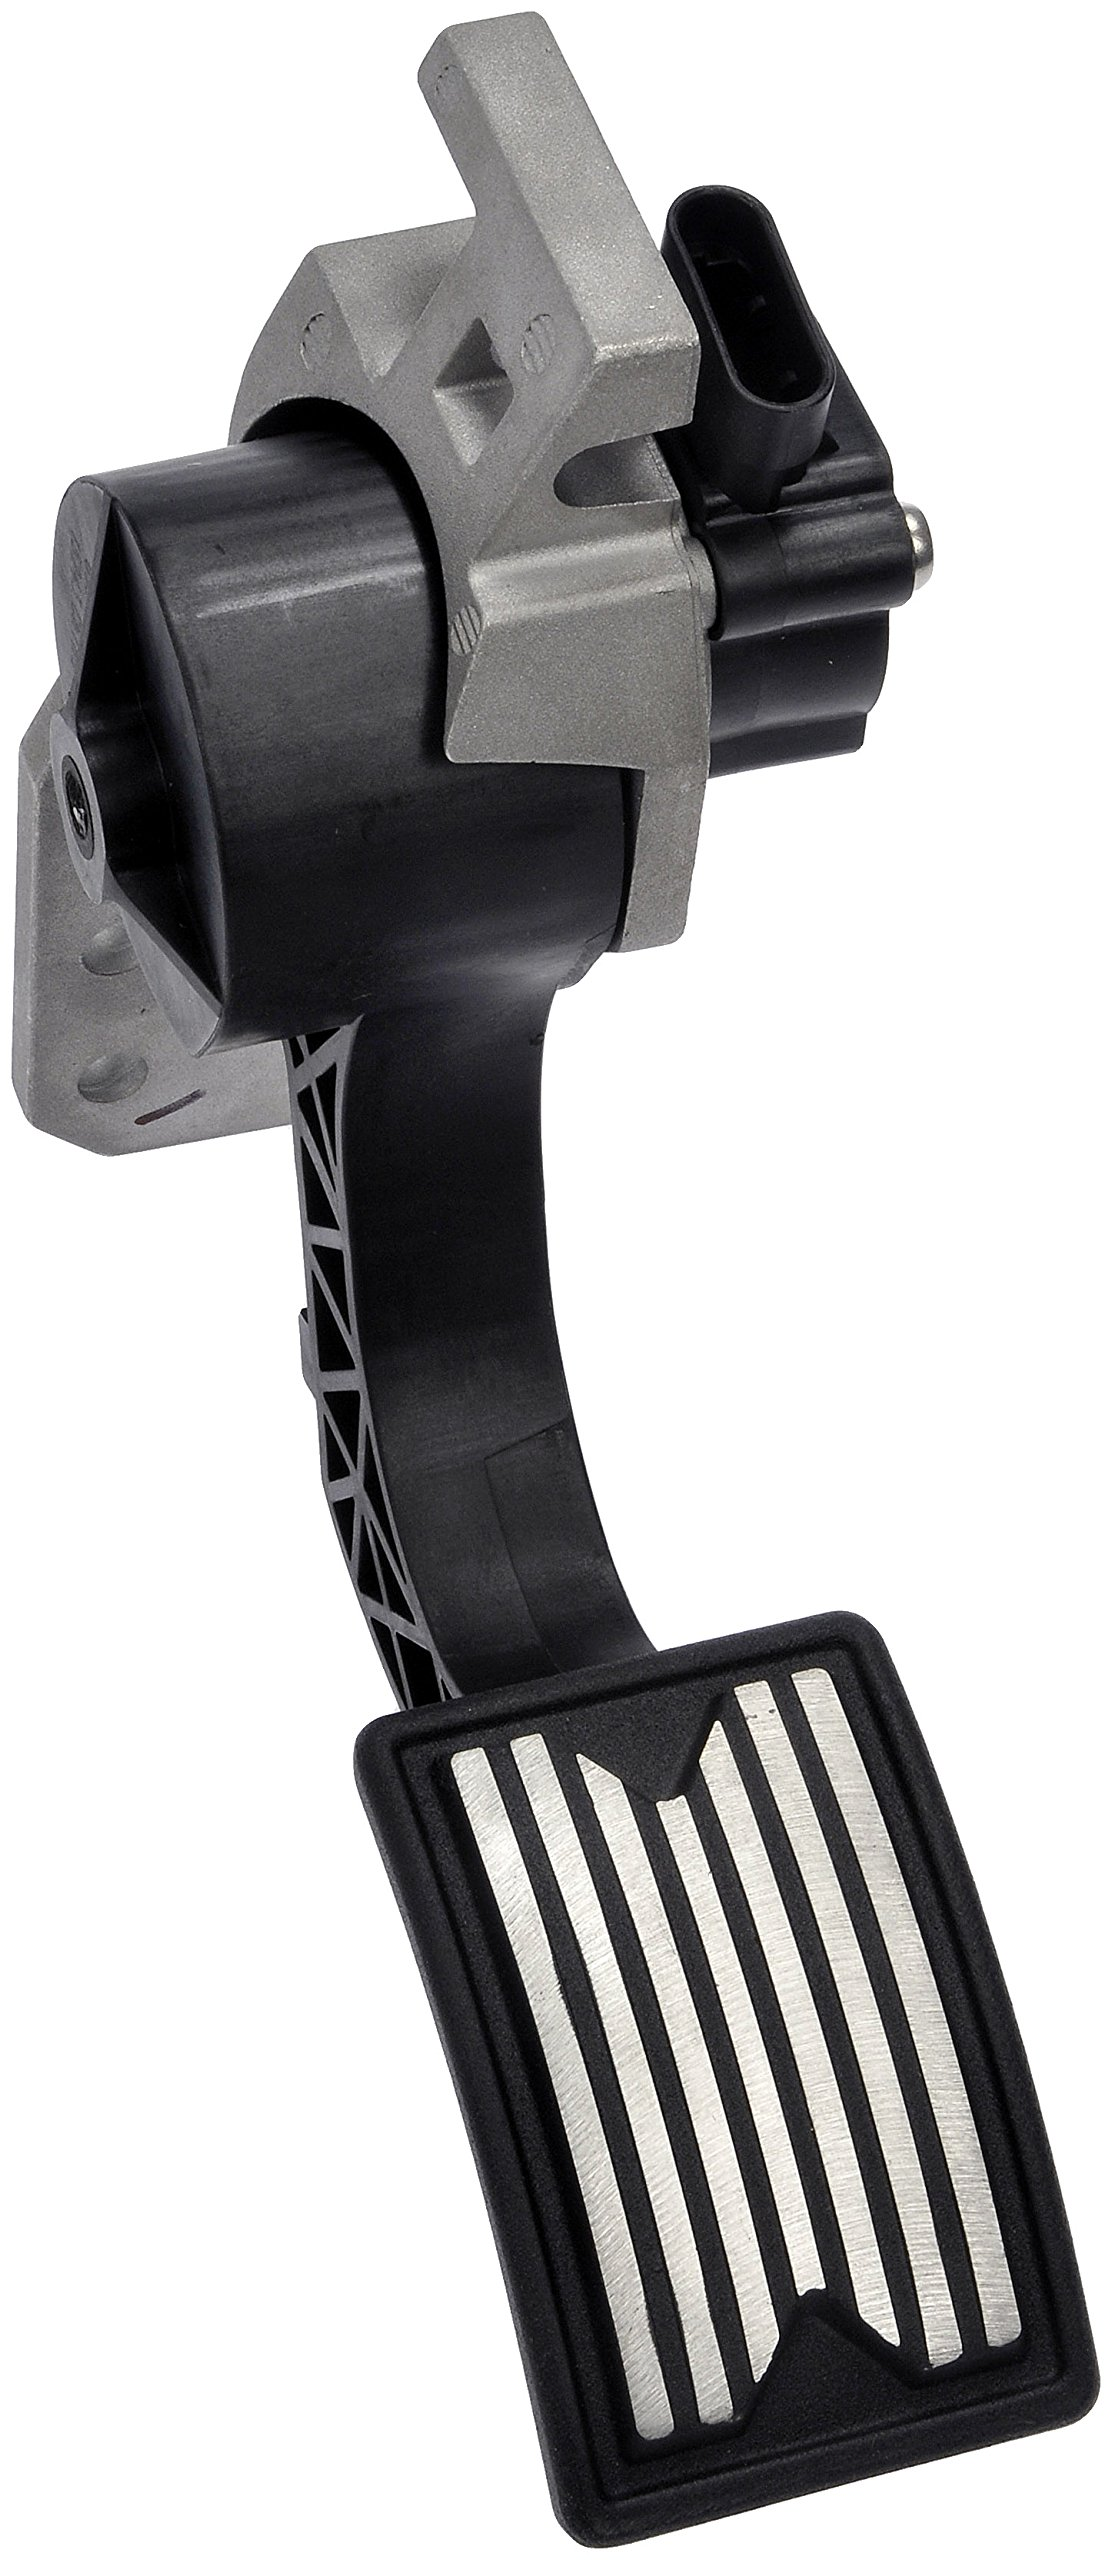 Dorman 699-5501 Accelerator Pedal Assembly by Dorman